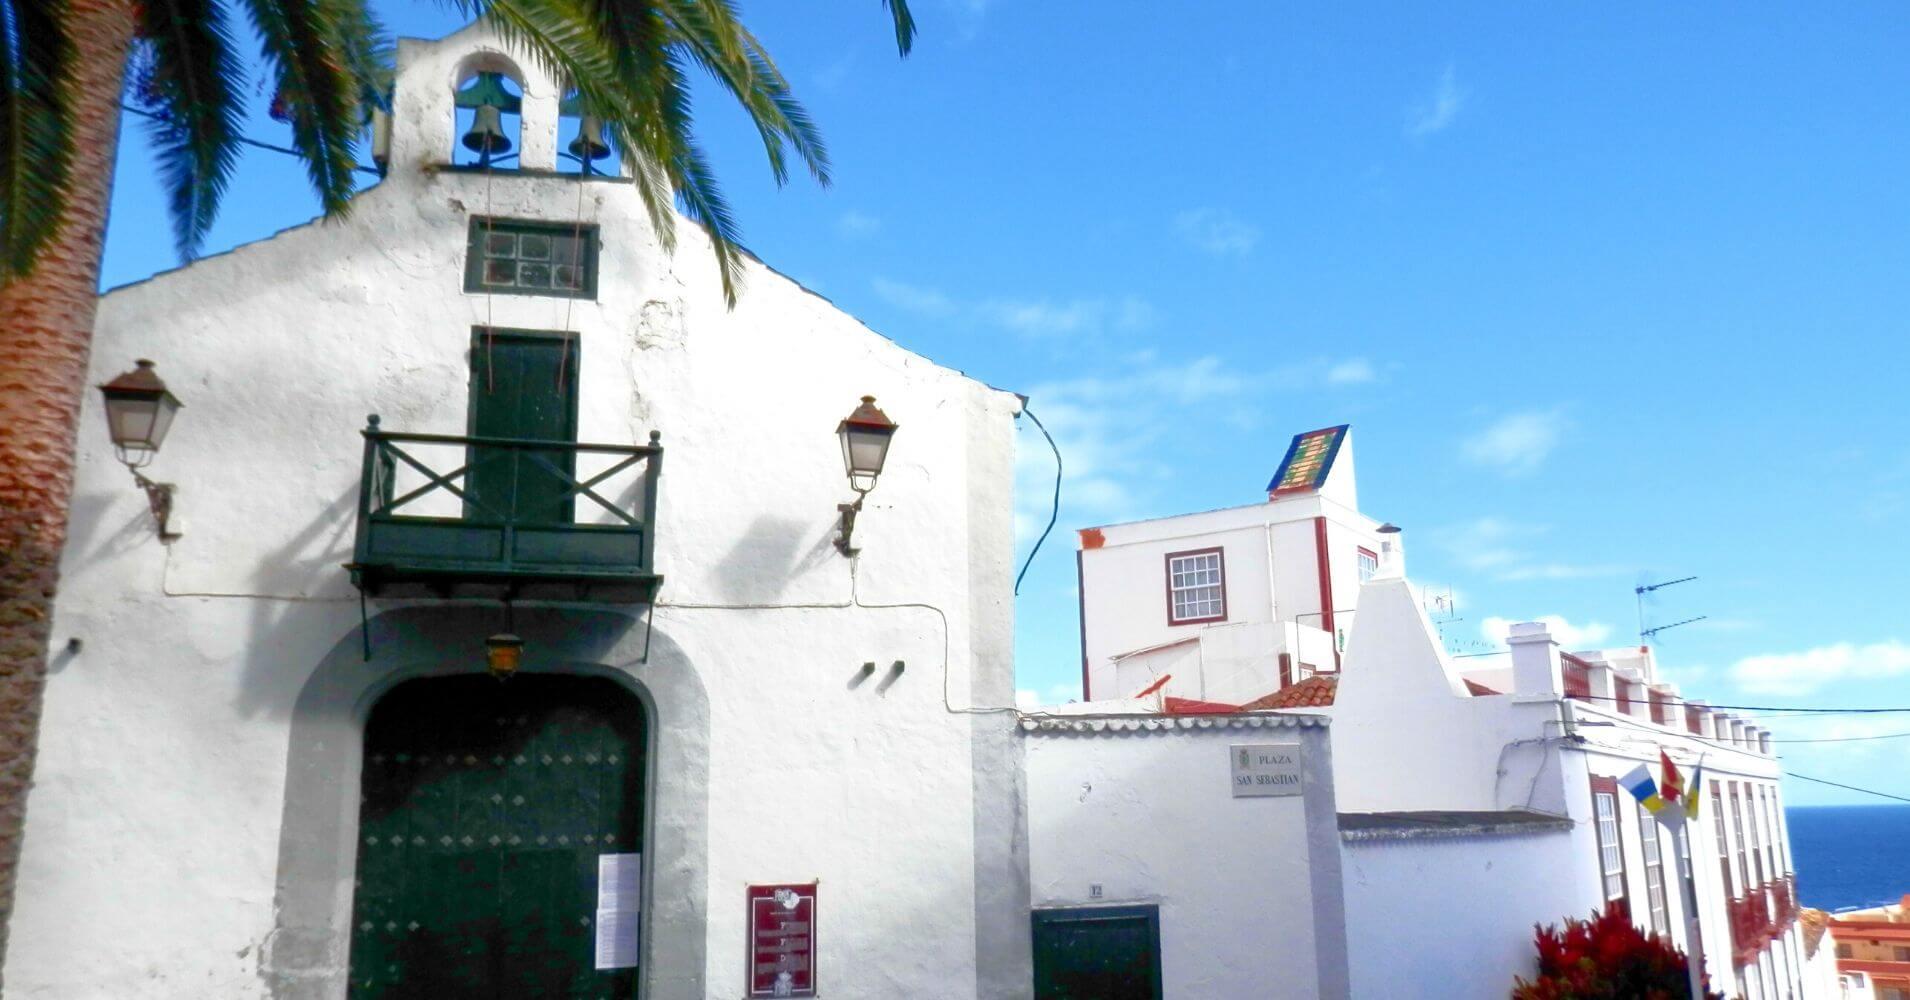 Ermita de San Sebastián. La Palma a ritmo lento, Islas Canarias.